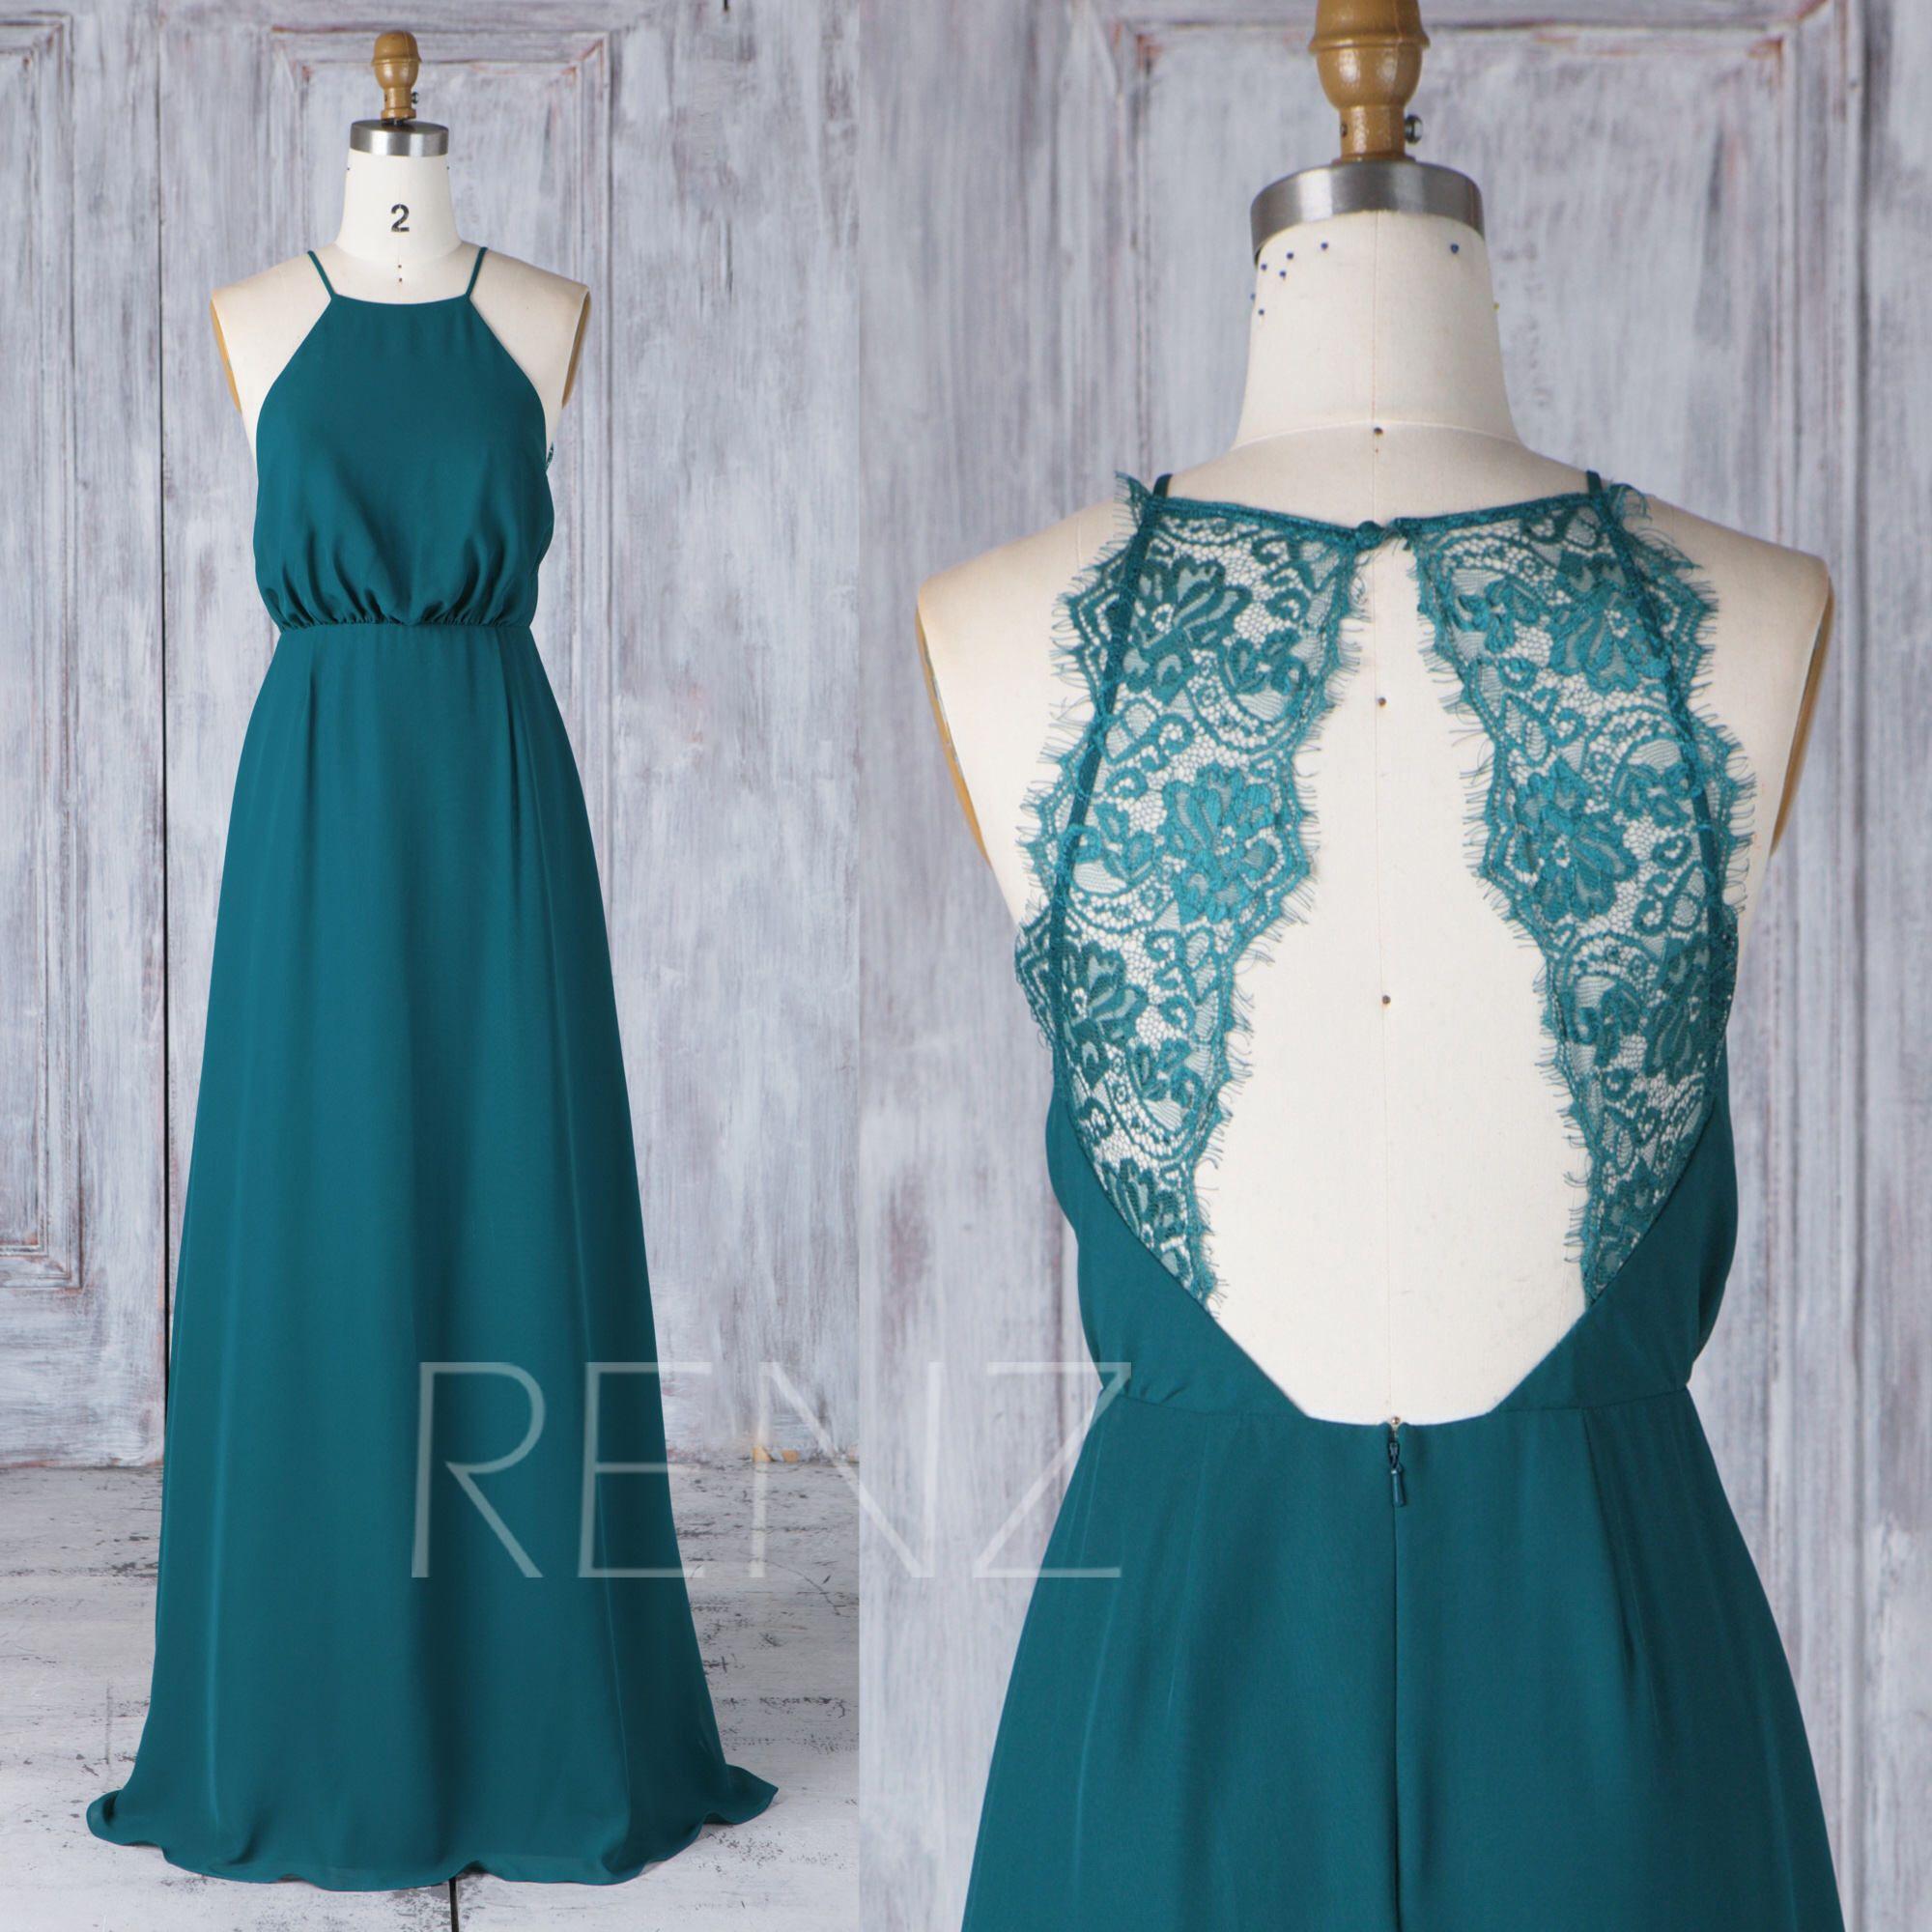 Colorful Infinity Bridesmaid Dress Etsy Elaboration - All Wedding ...